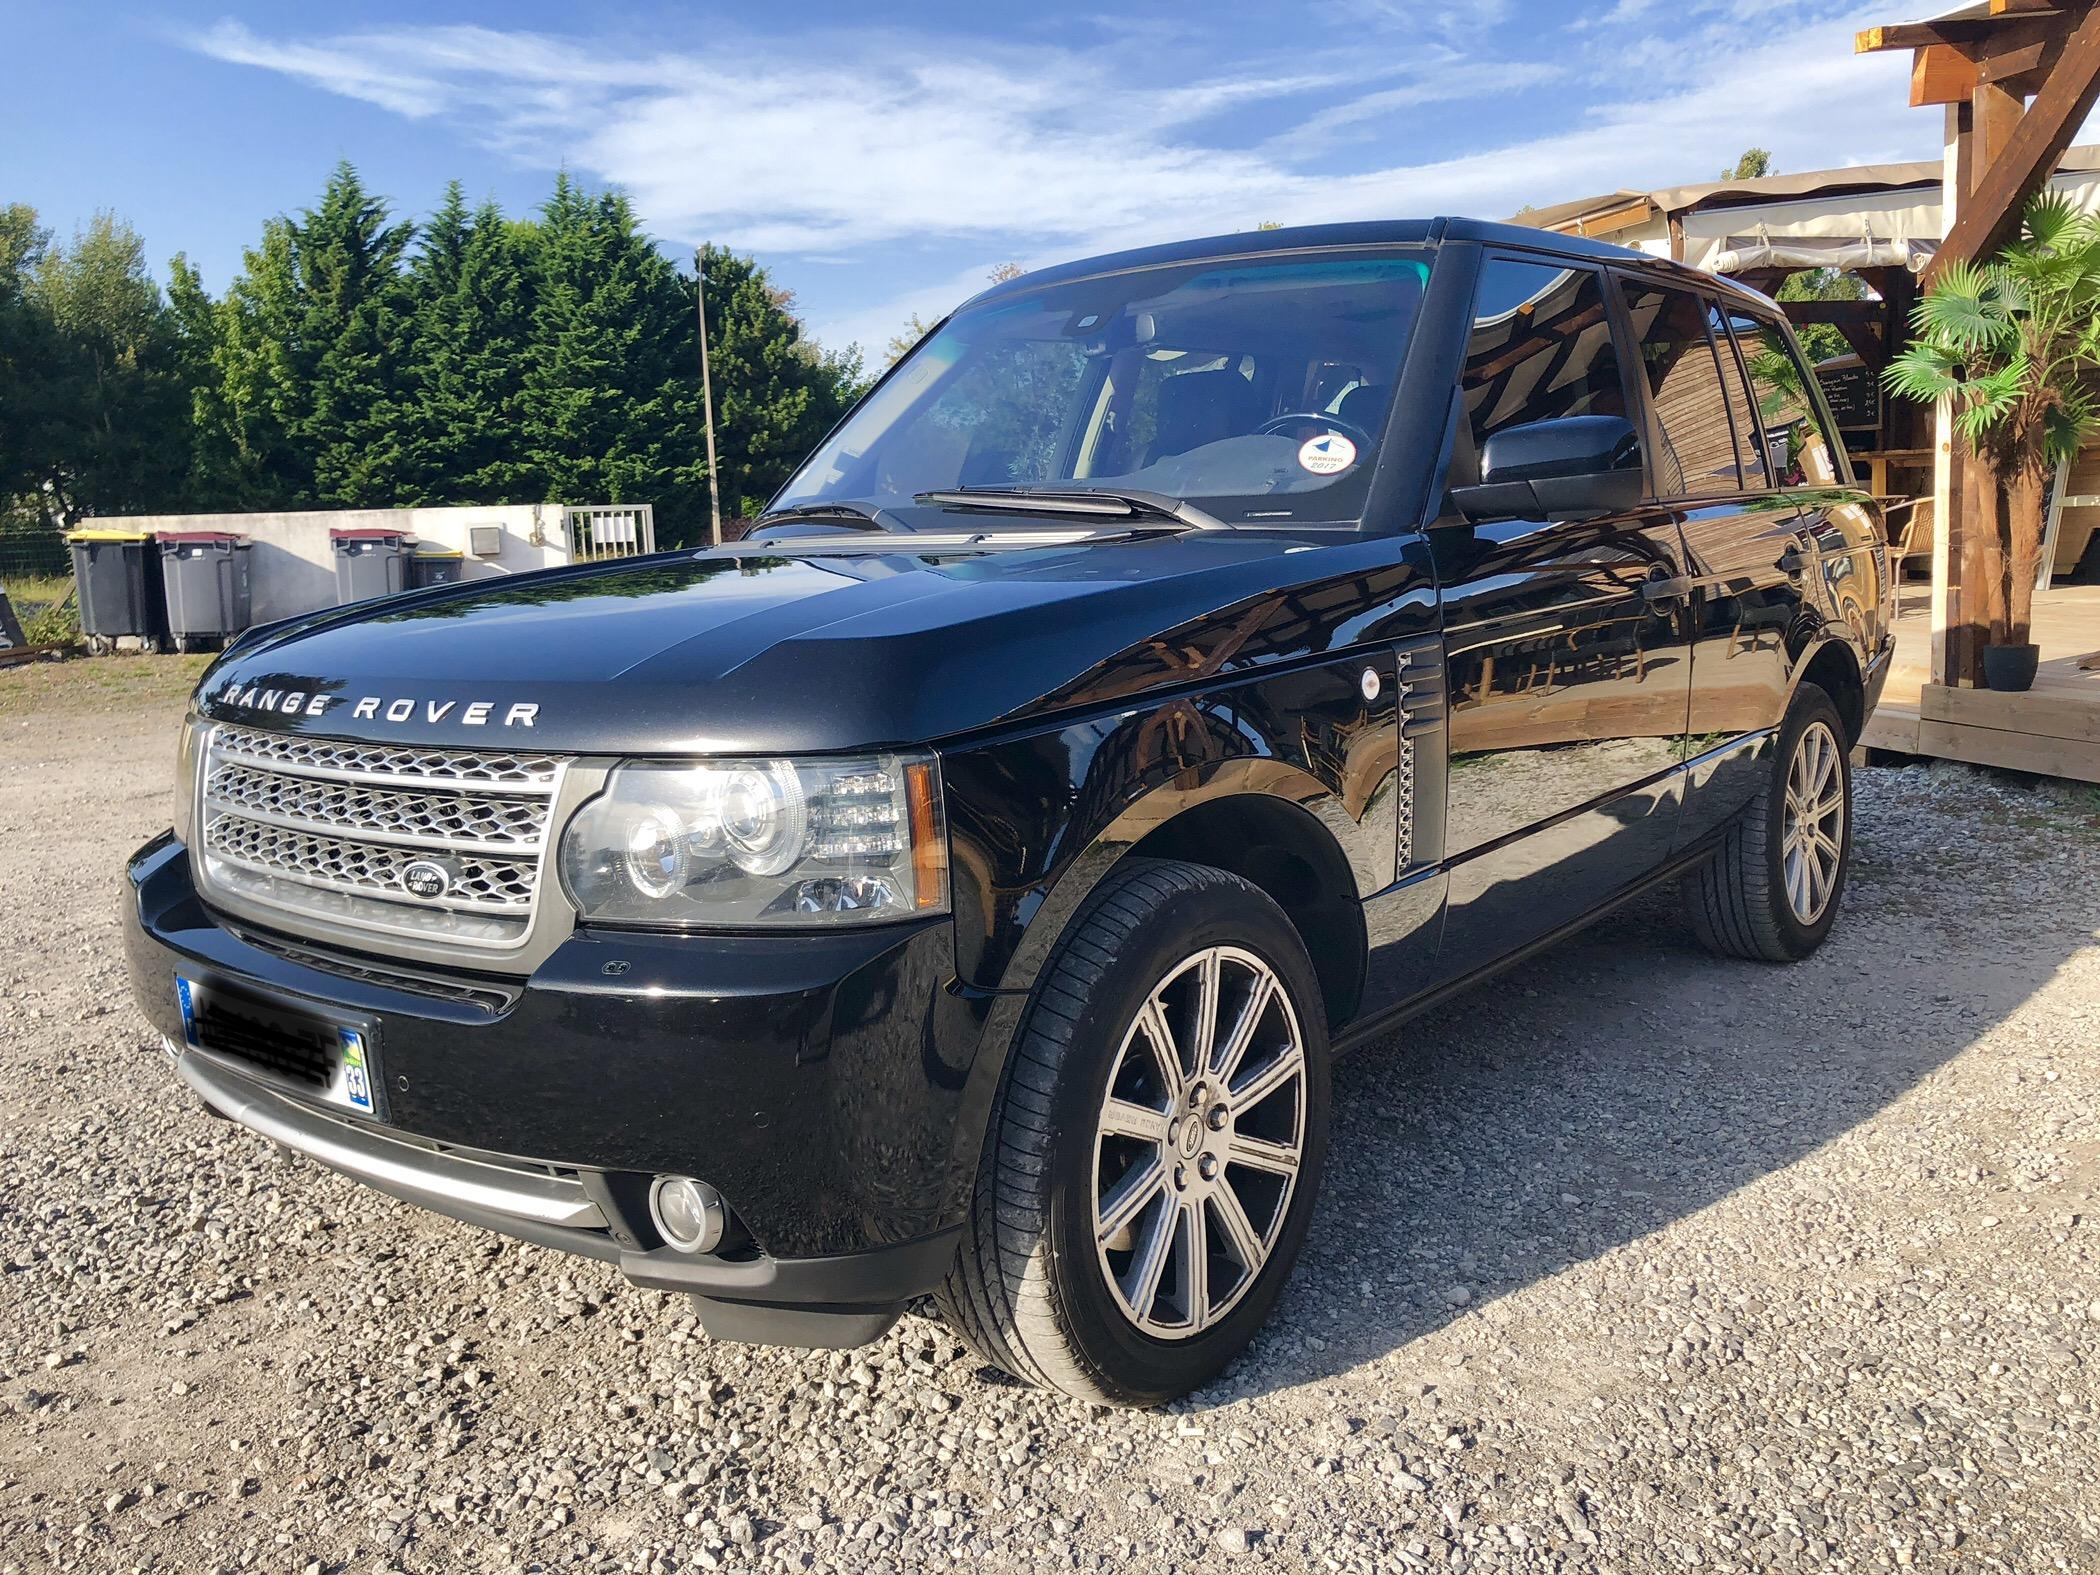 Range Rover version Autobiography de 2010